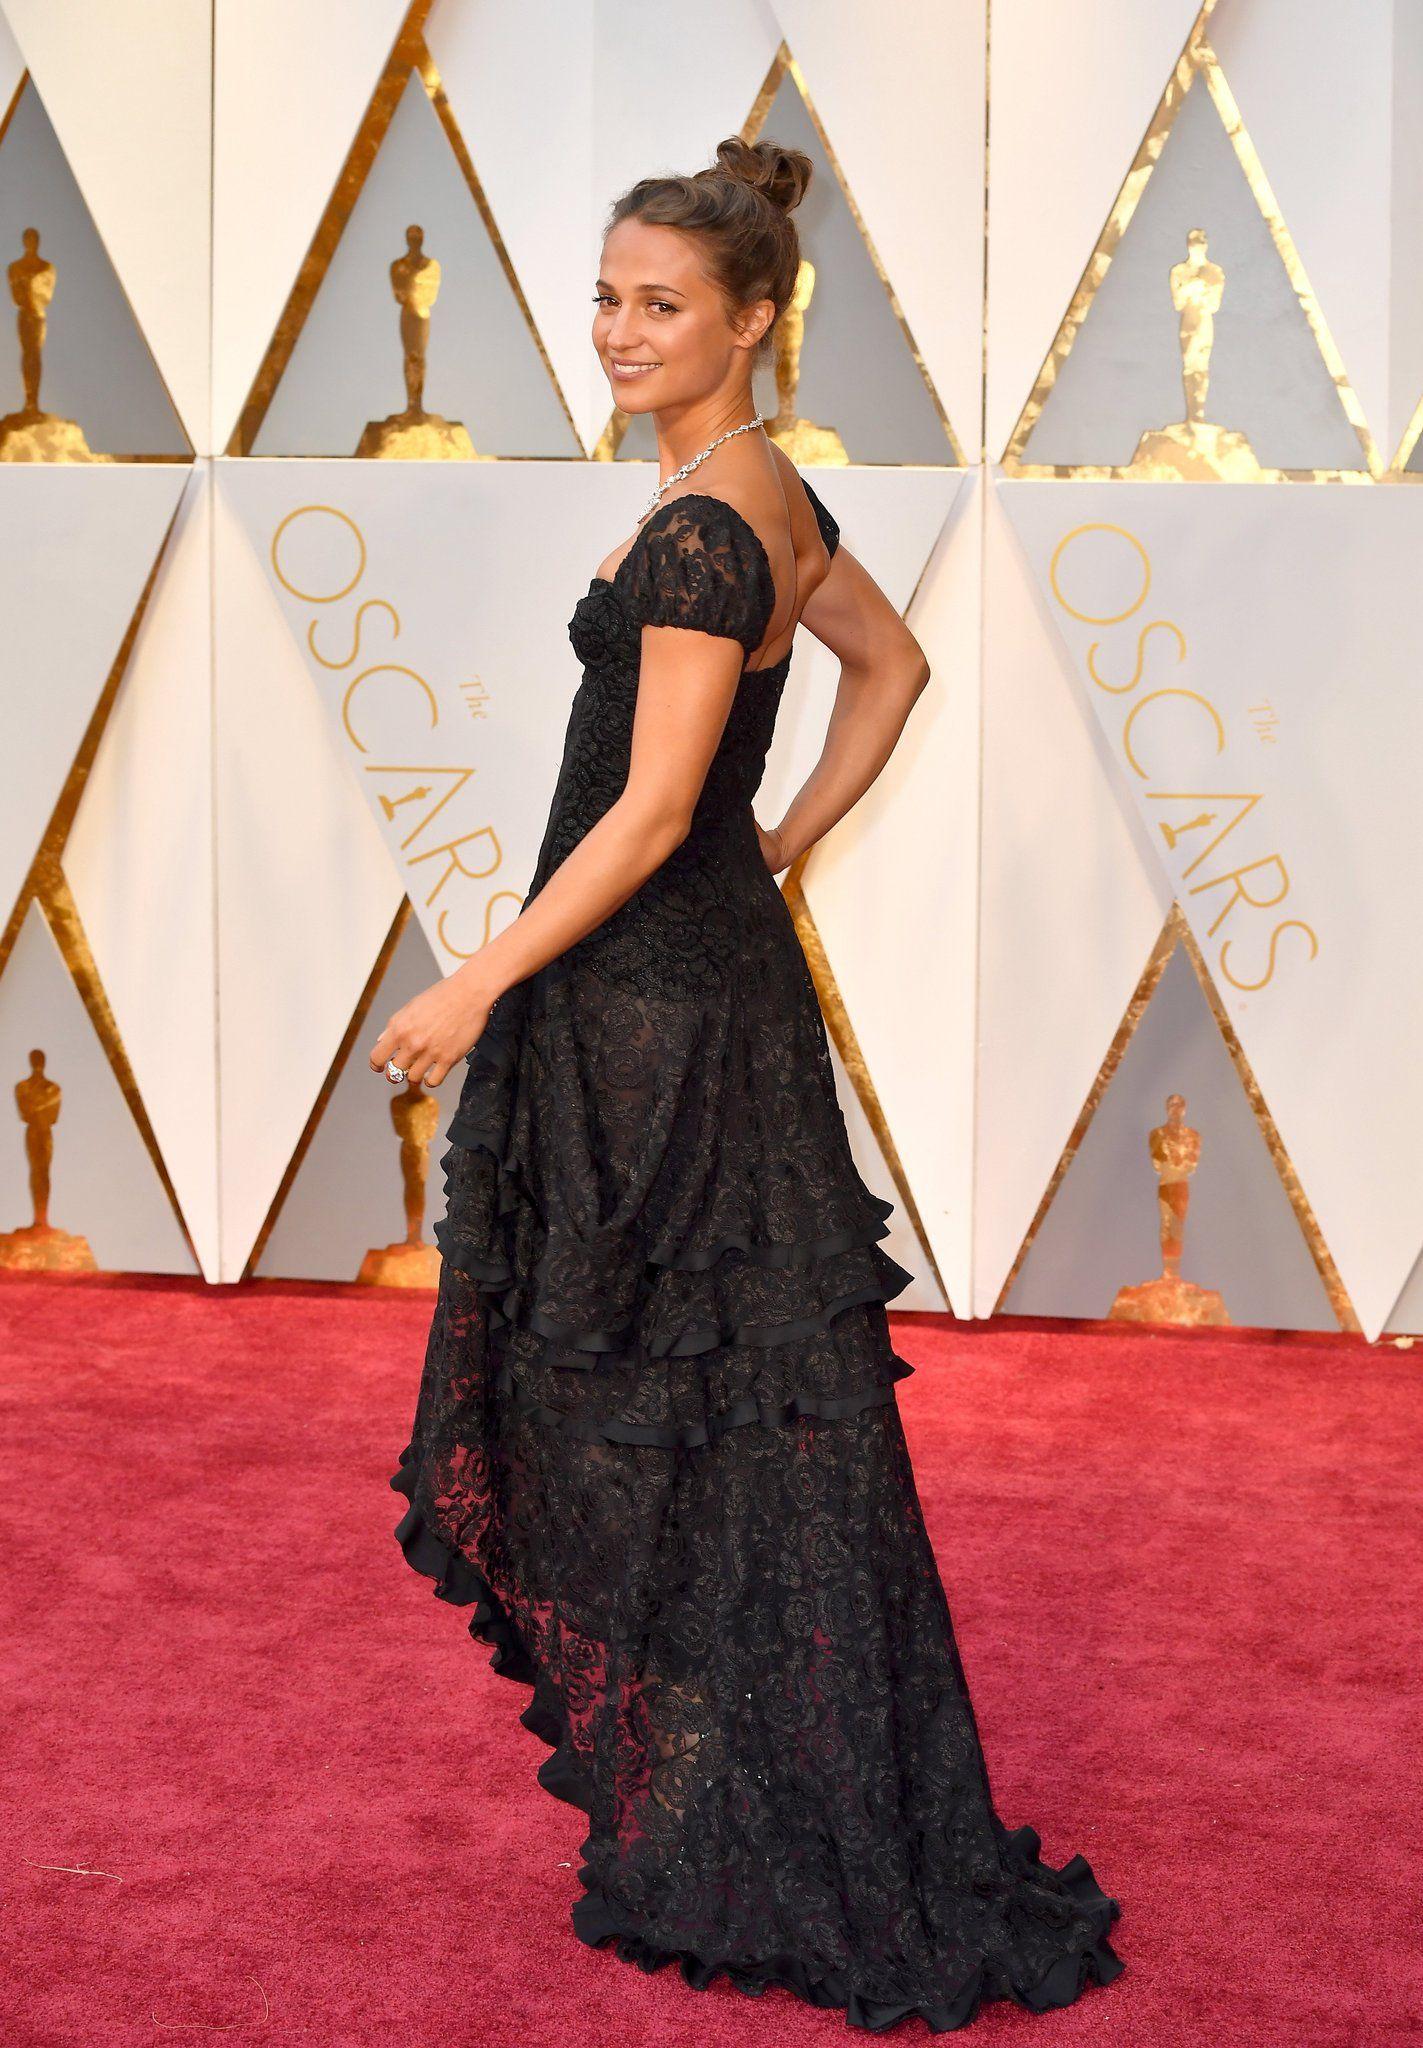 Alicia Vikander Oscar 2017 Red Carpet Arrival Oscars Red Carpet Arrivals 2017 Oscars 2017 Photos Red Carpet Oscars Nice Dresses Dresses